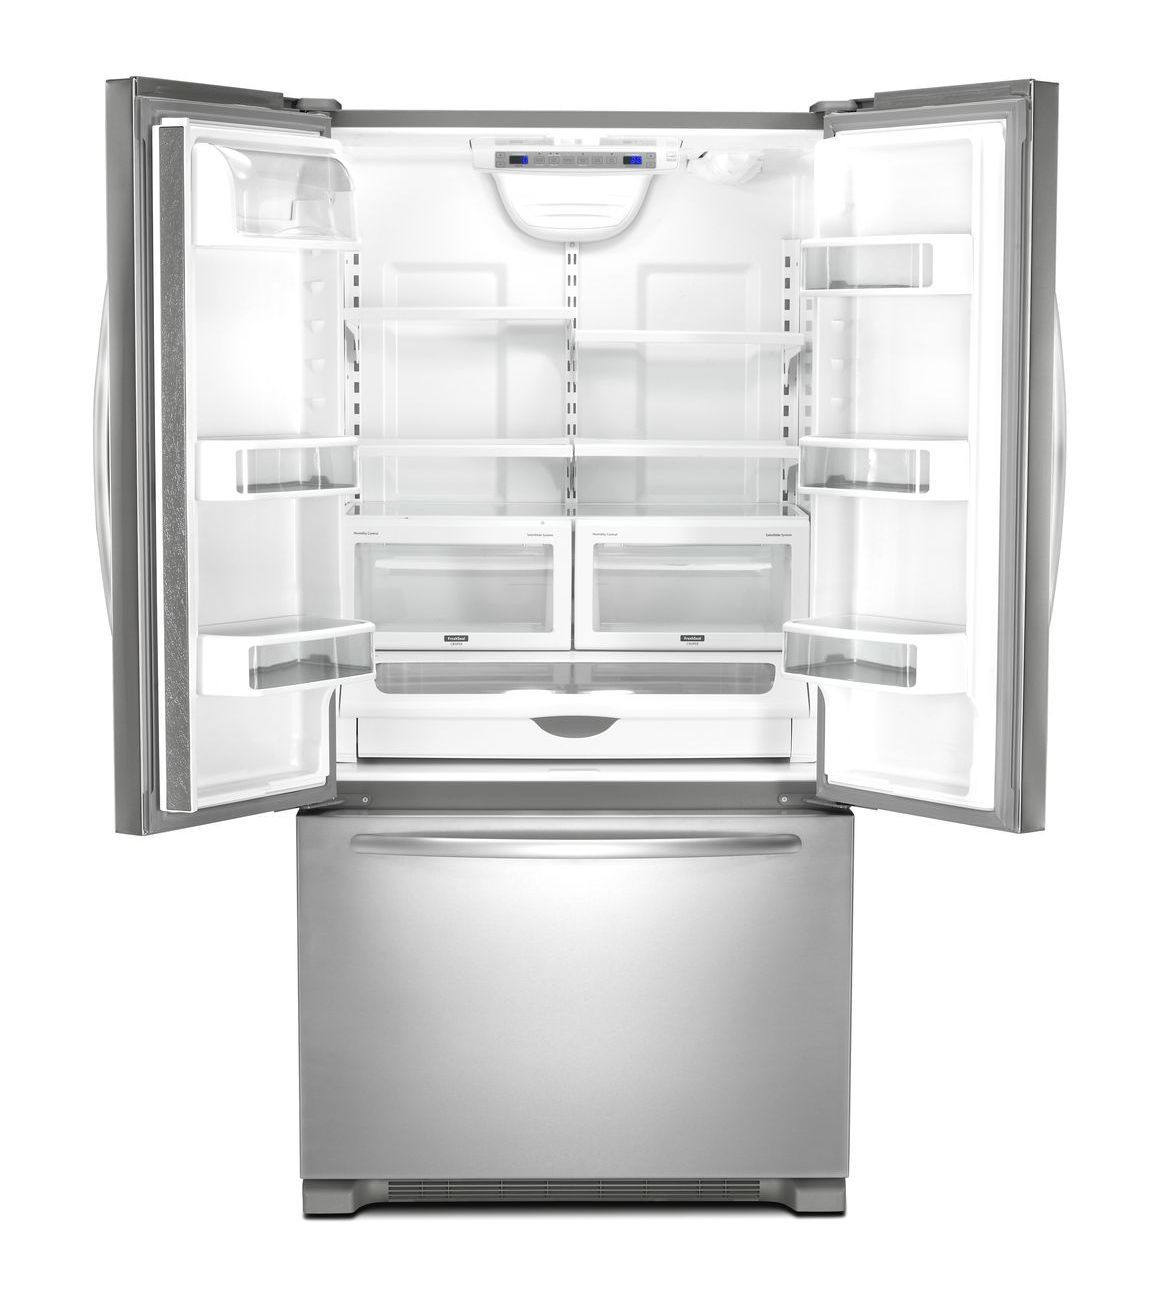 KitchenAid® 22 Cu. Ft. Counter Depth French Door Refrigerator, Architect®  Series II